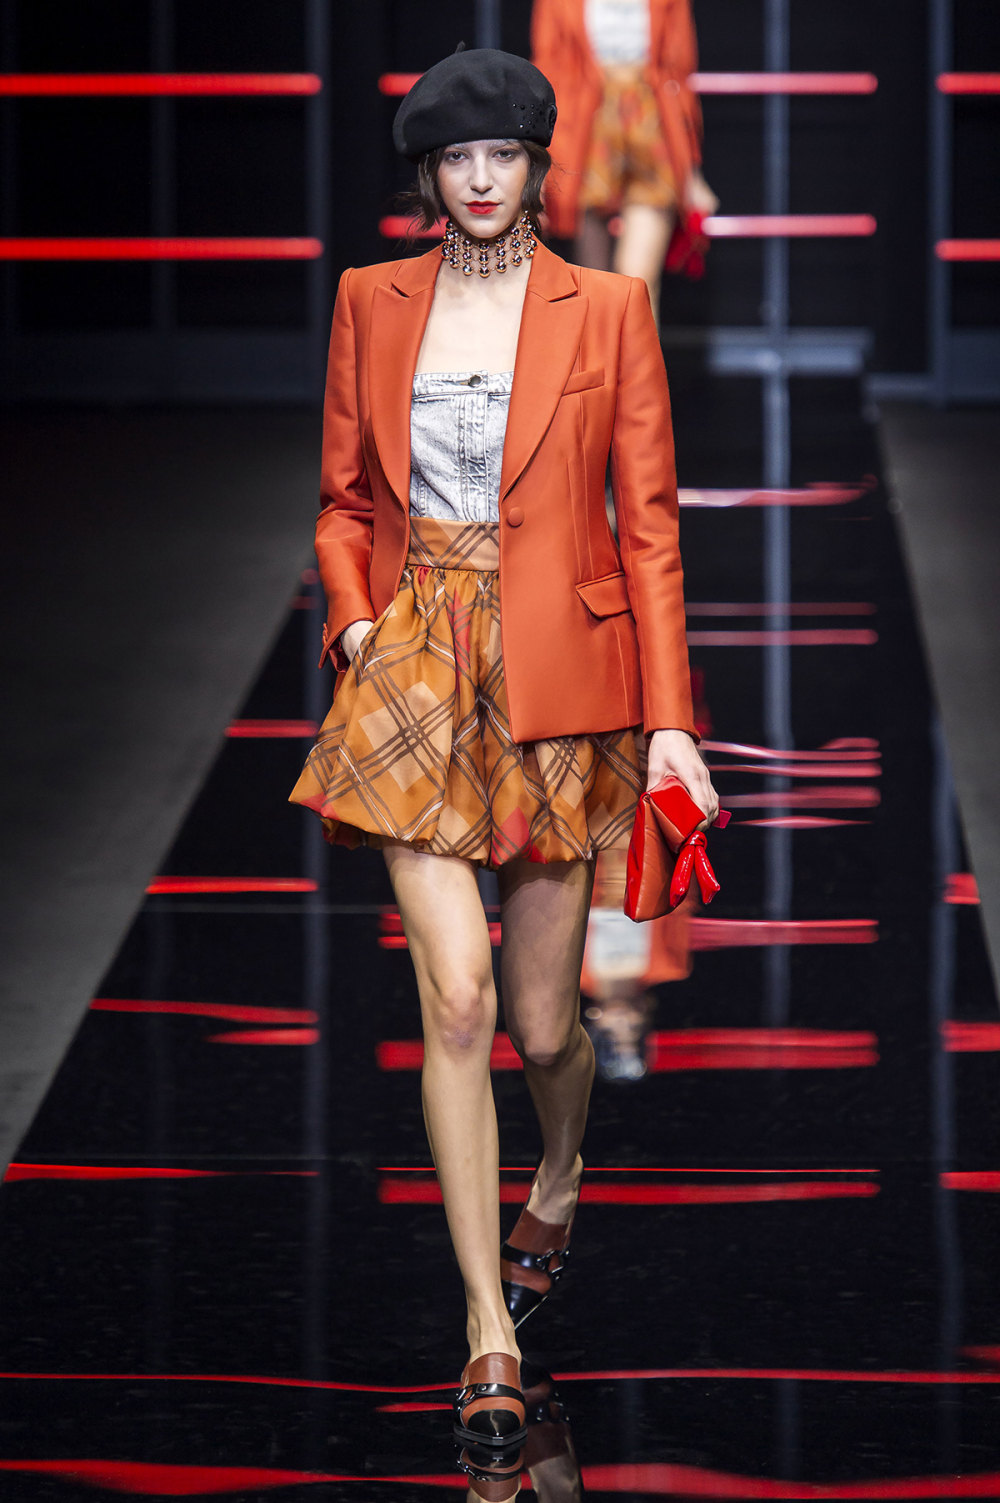 Emporio Armani时装系列畅的裤子带有柔滑裙子的鸡尾酒礼服-15.jpg